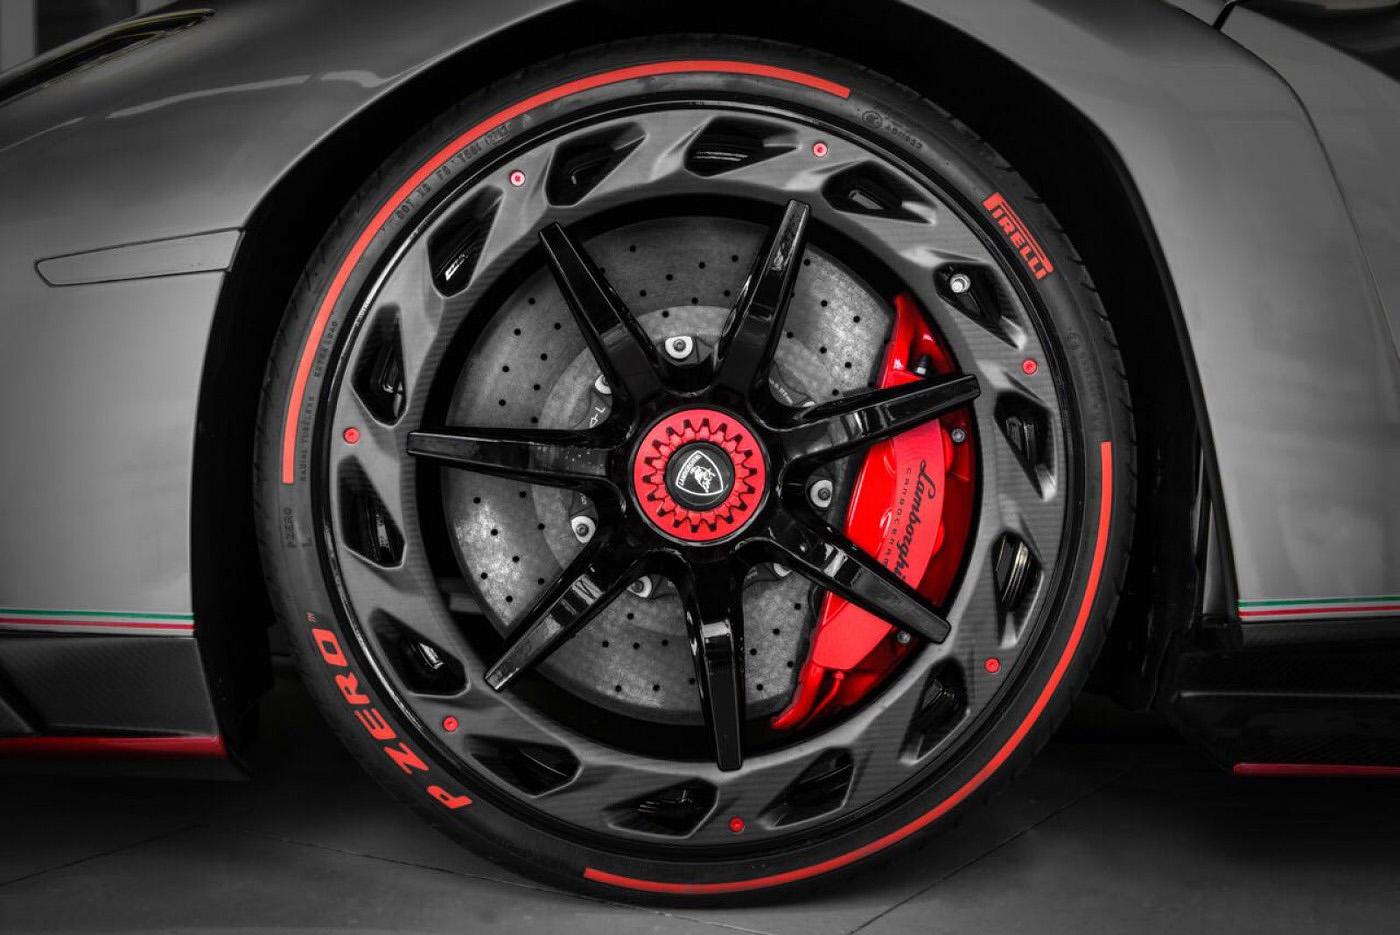 Felgi w Lamborghini Veneno Coupe, blog motoryzacyjny